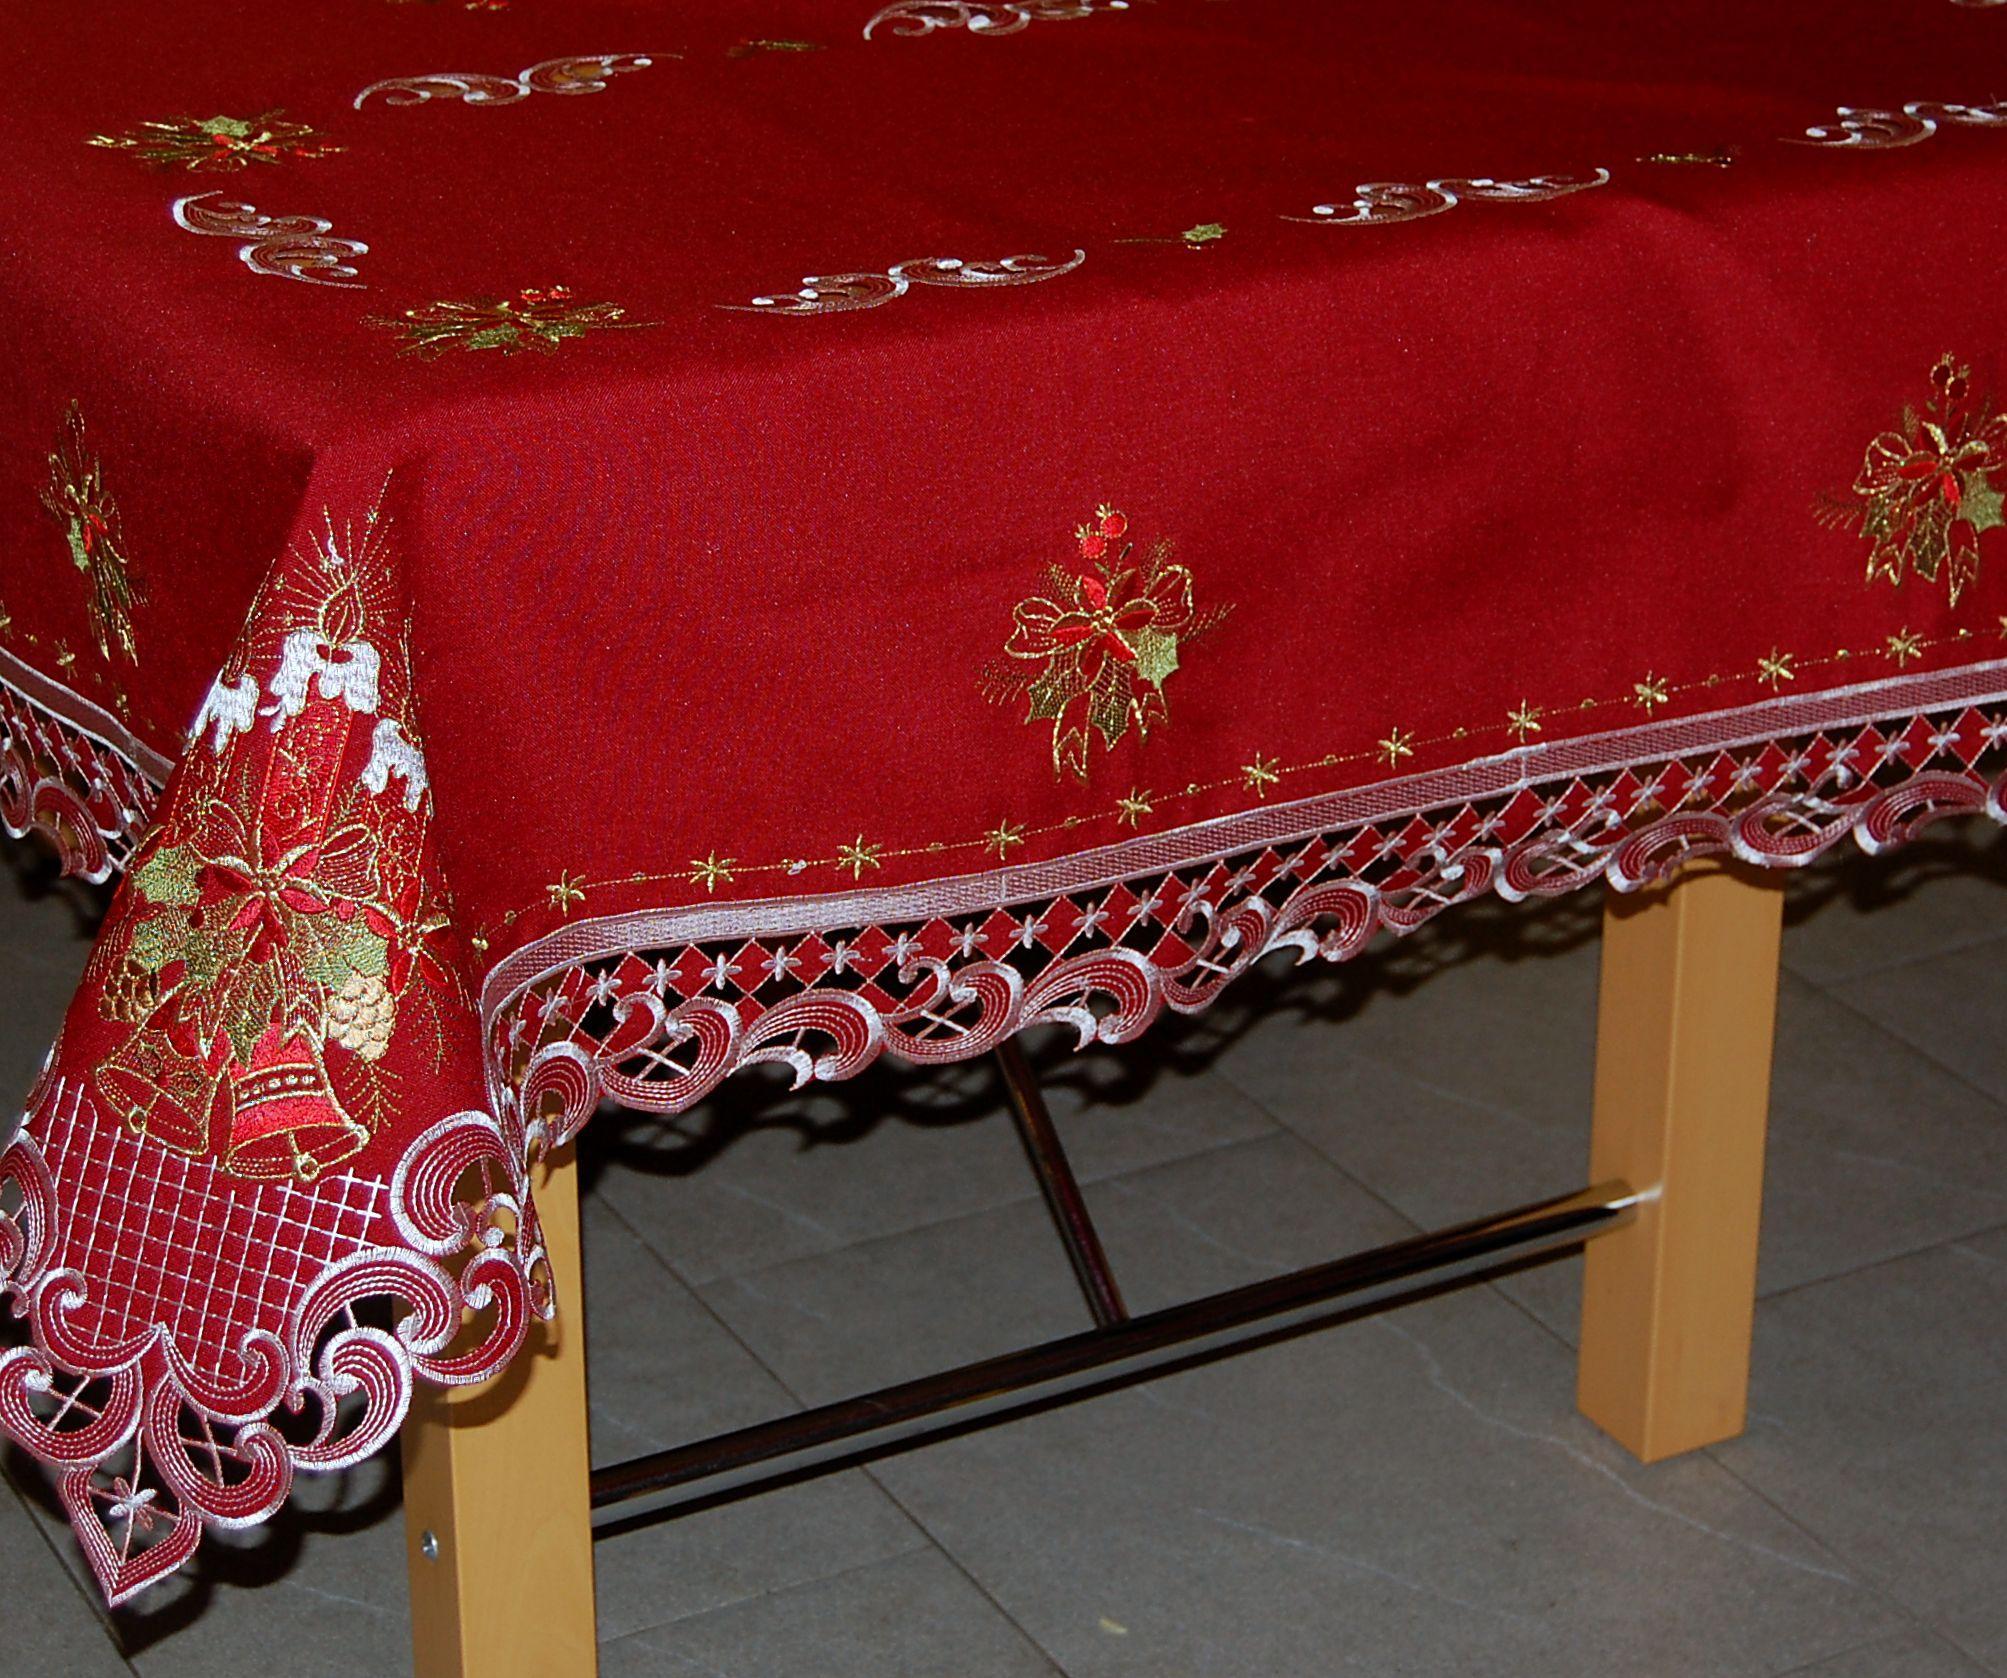 tischdecke weihnachten weinrot 3 kerzen rot gold. Black Bedroom Furniture Sets. Home Design Ideas